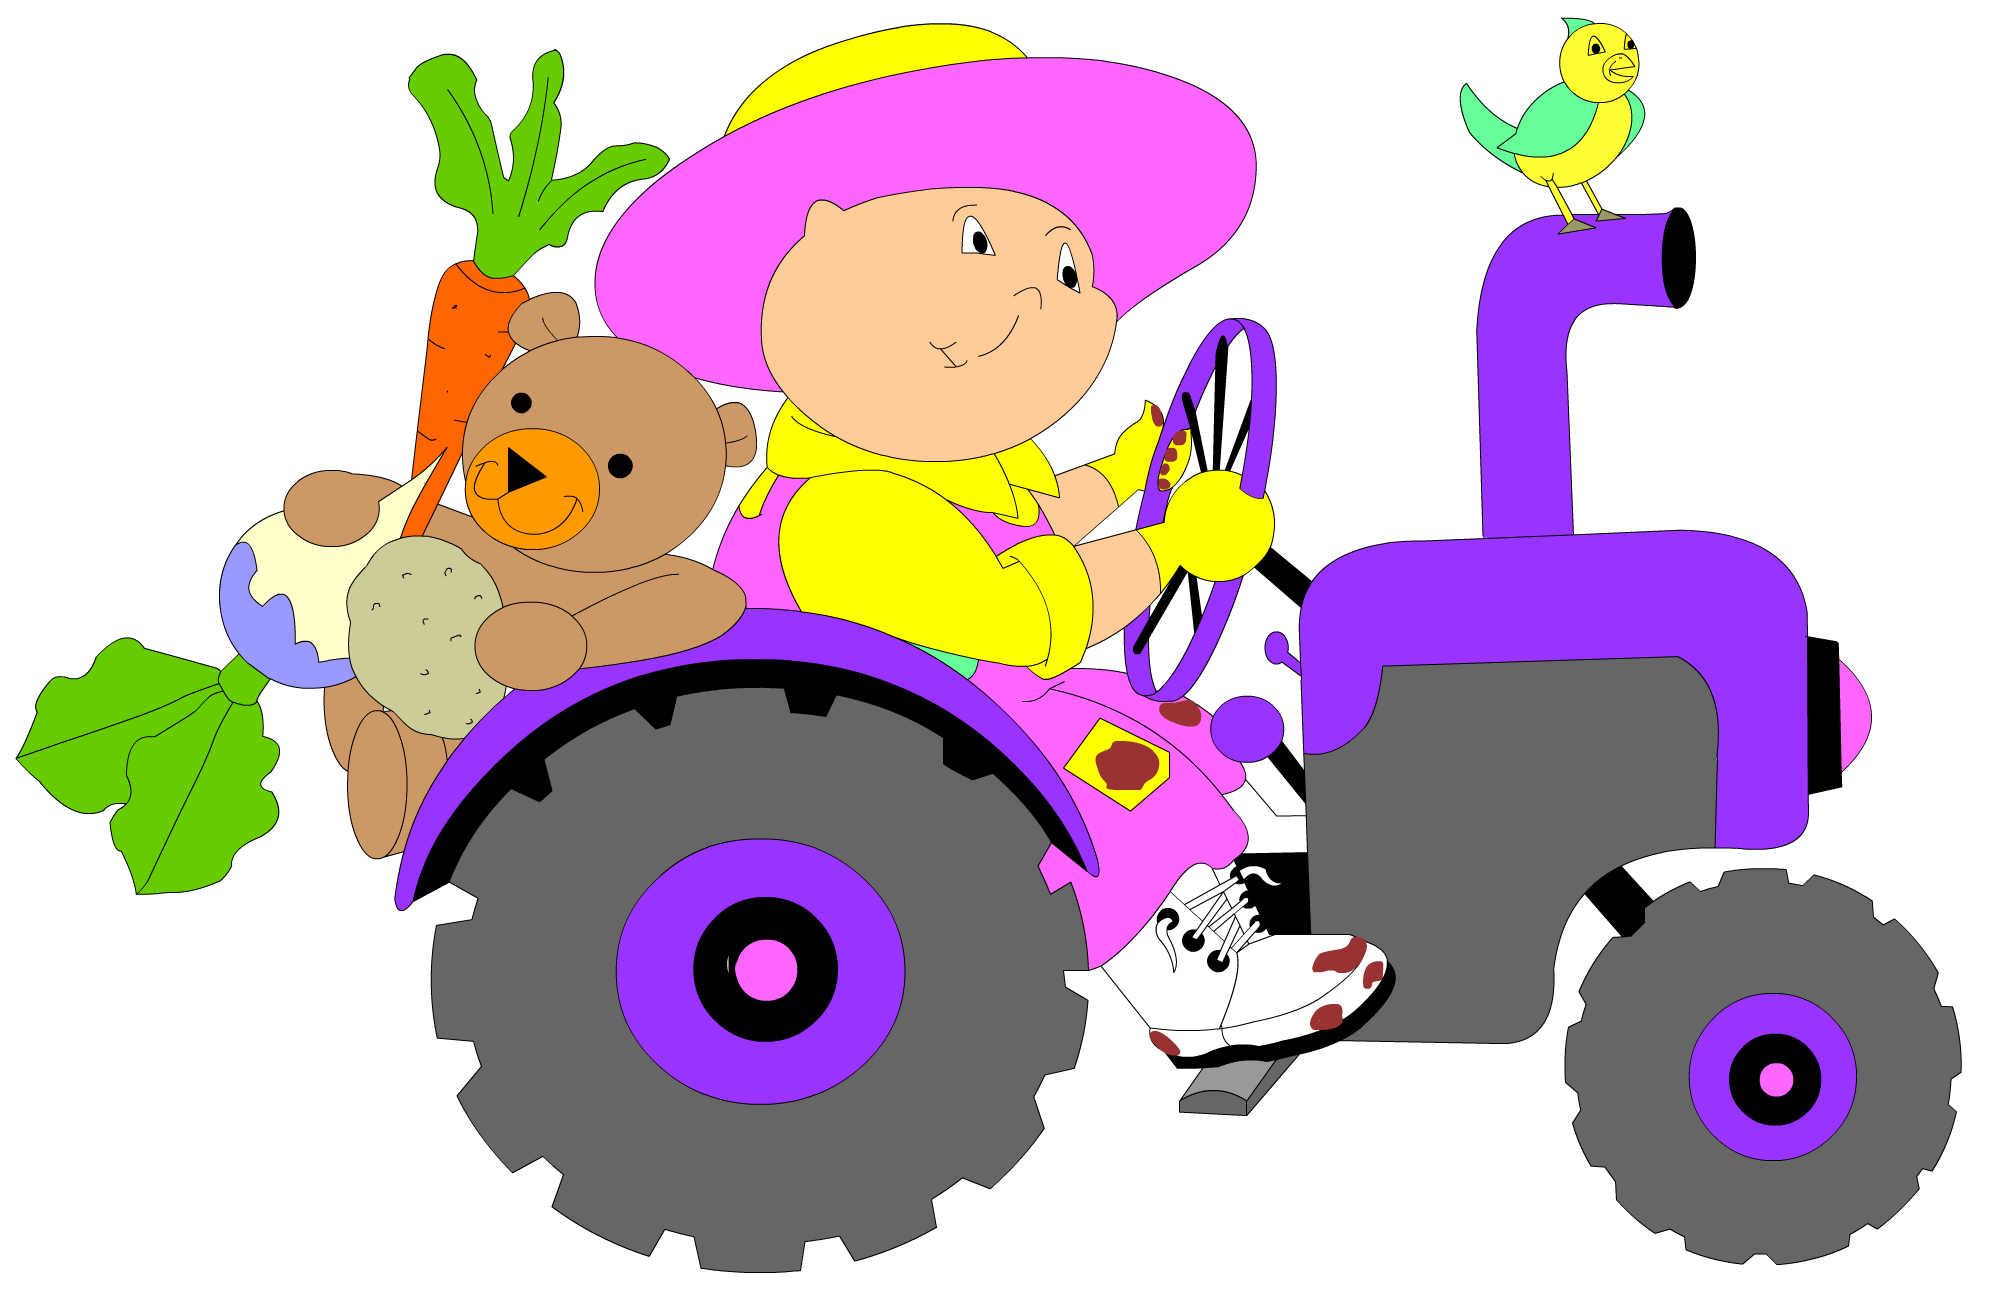 Baby onesies custom gardener. Gardening clipart children's